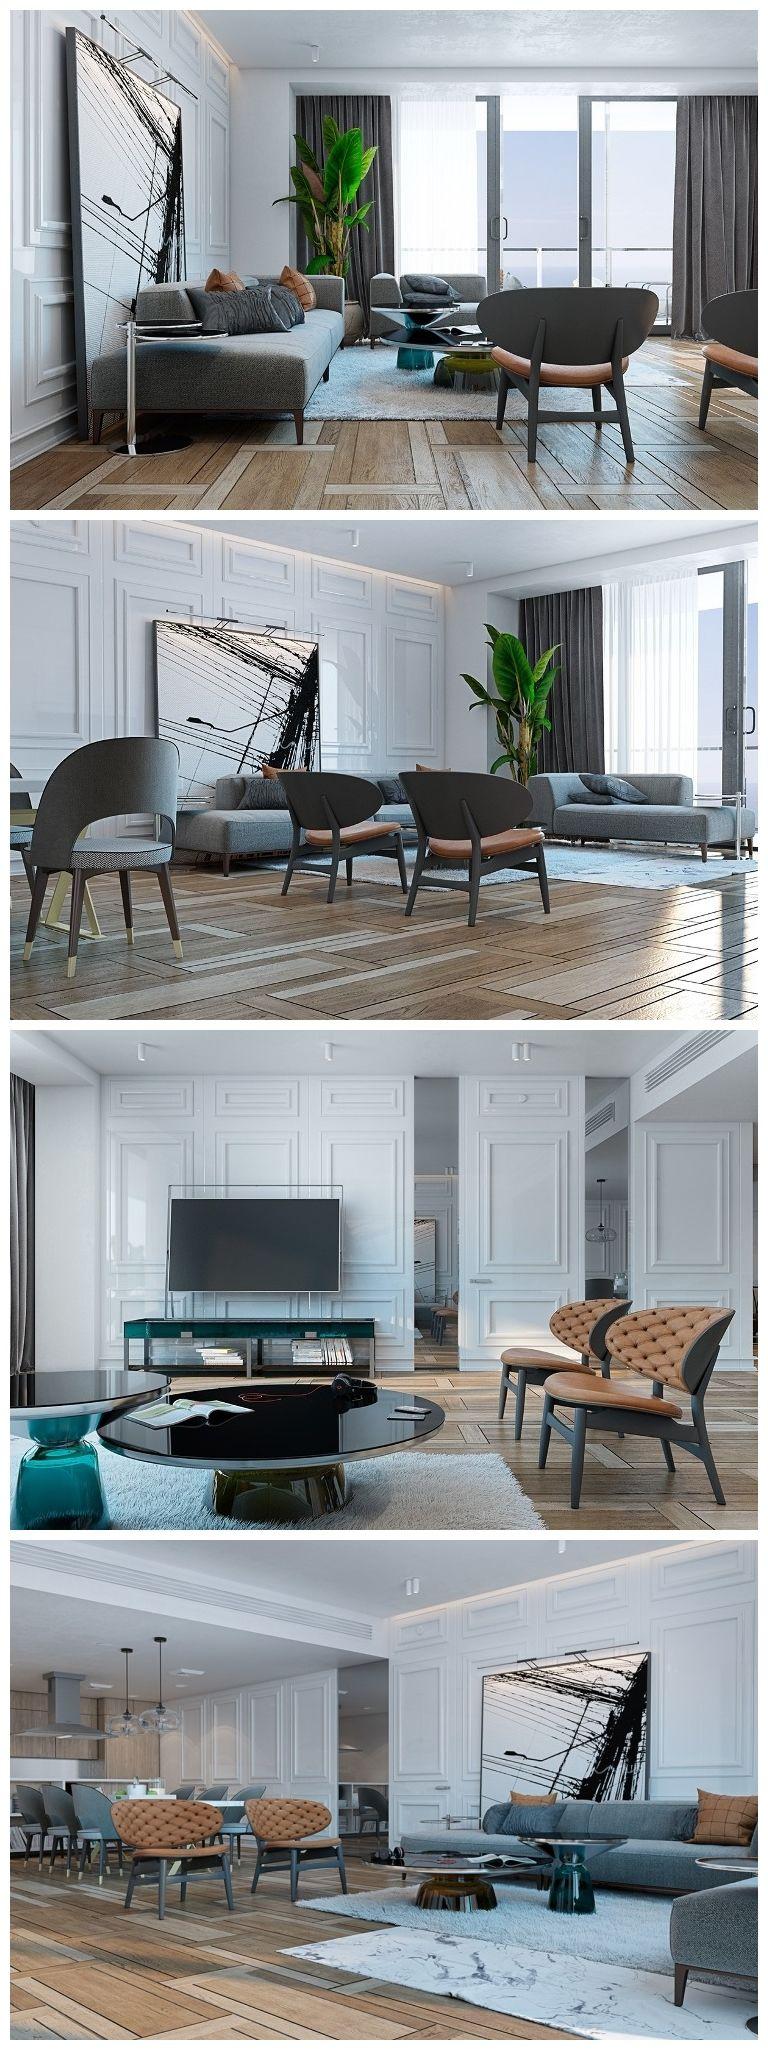 A Miami Apartment in Stormy, Muted Tones | Pinterest | Dezeen, Miami ...